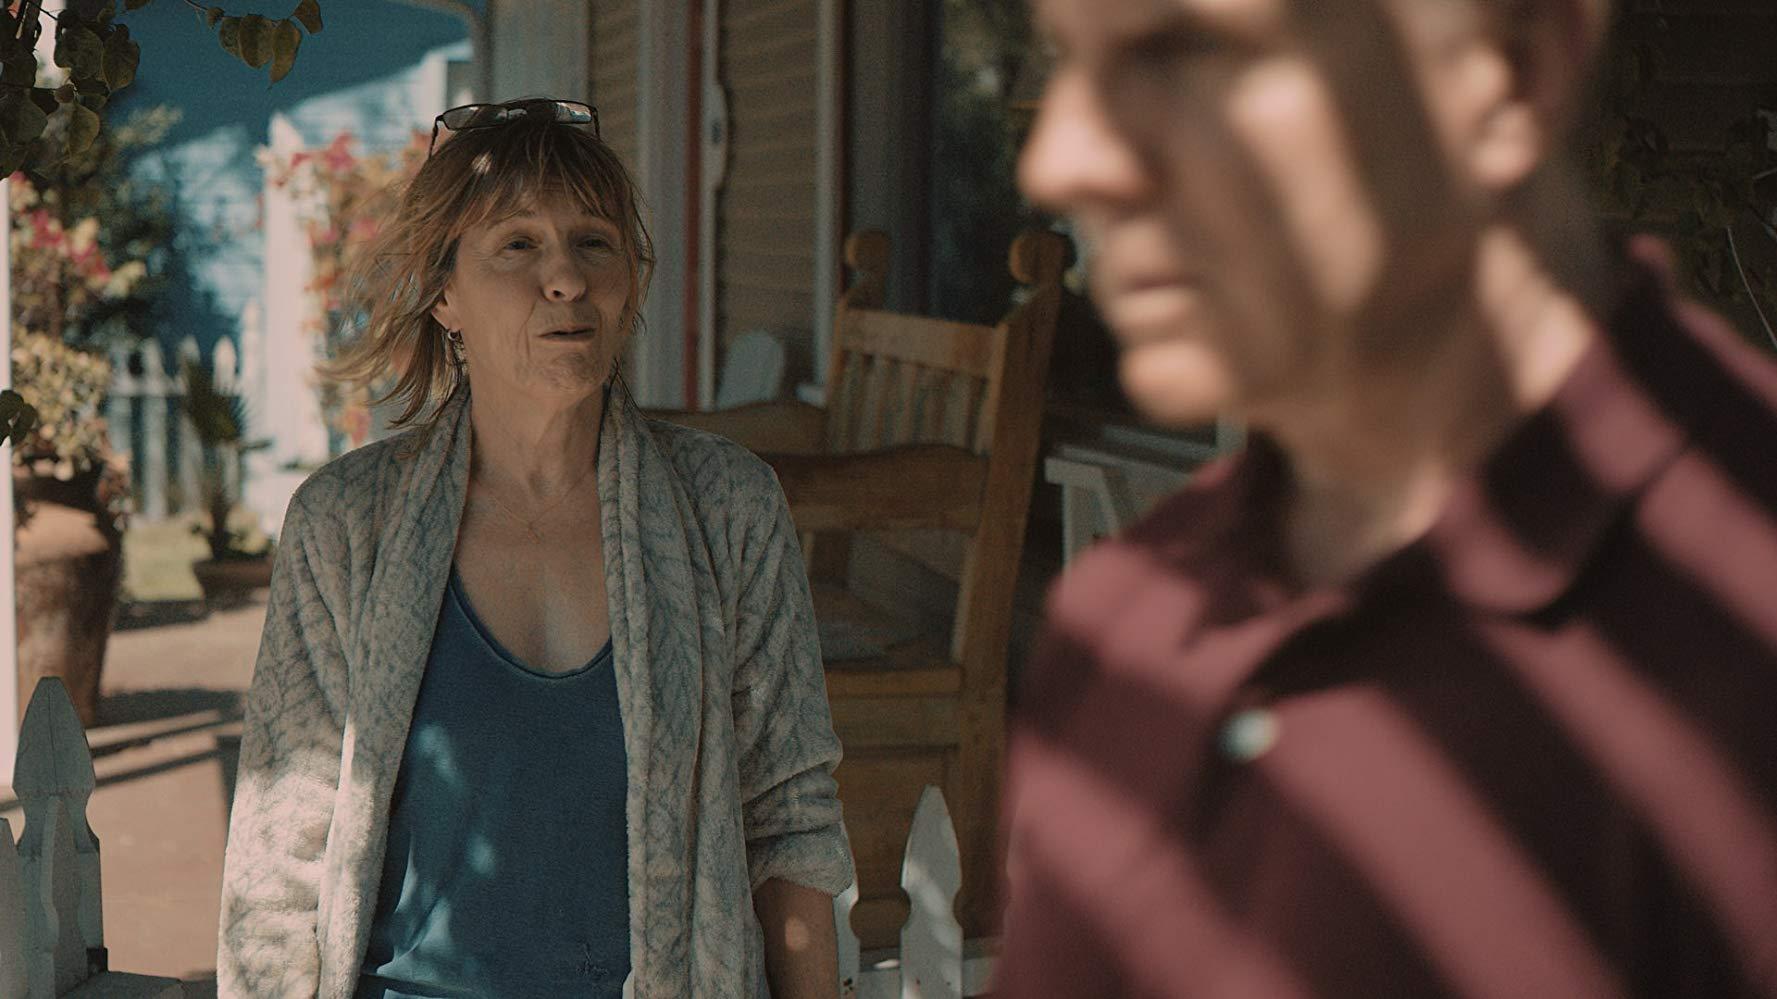 مشاهدة فيلم Fishbowl California 2018 HD مترجم كامل اون لاين